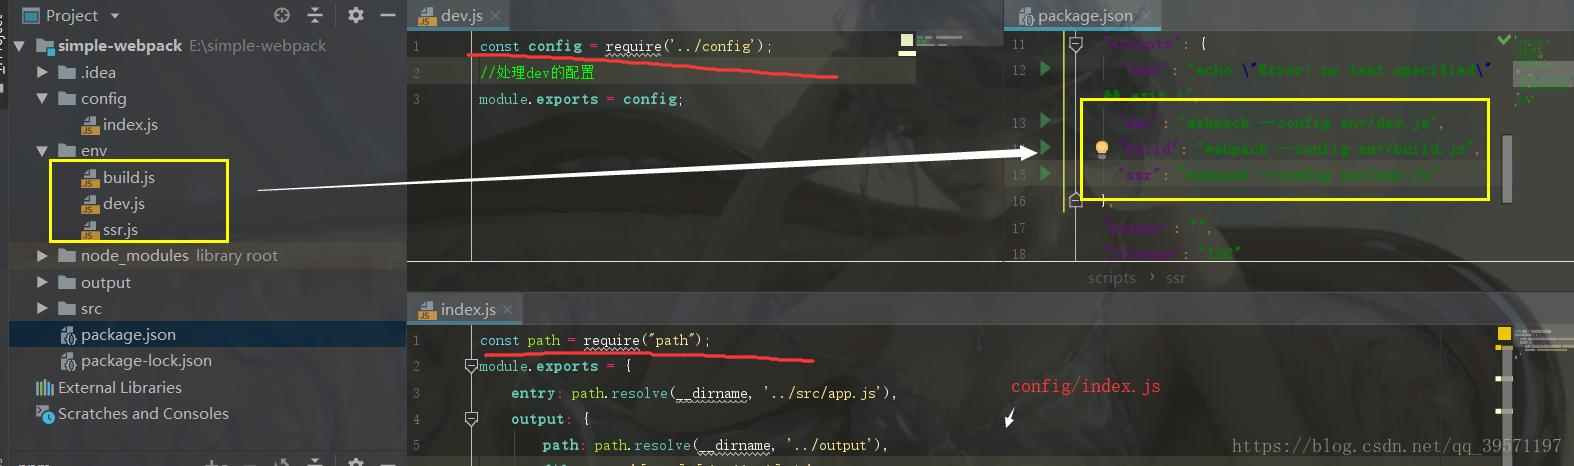 Vue ssr rendering (2) - Programmer Sought